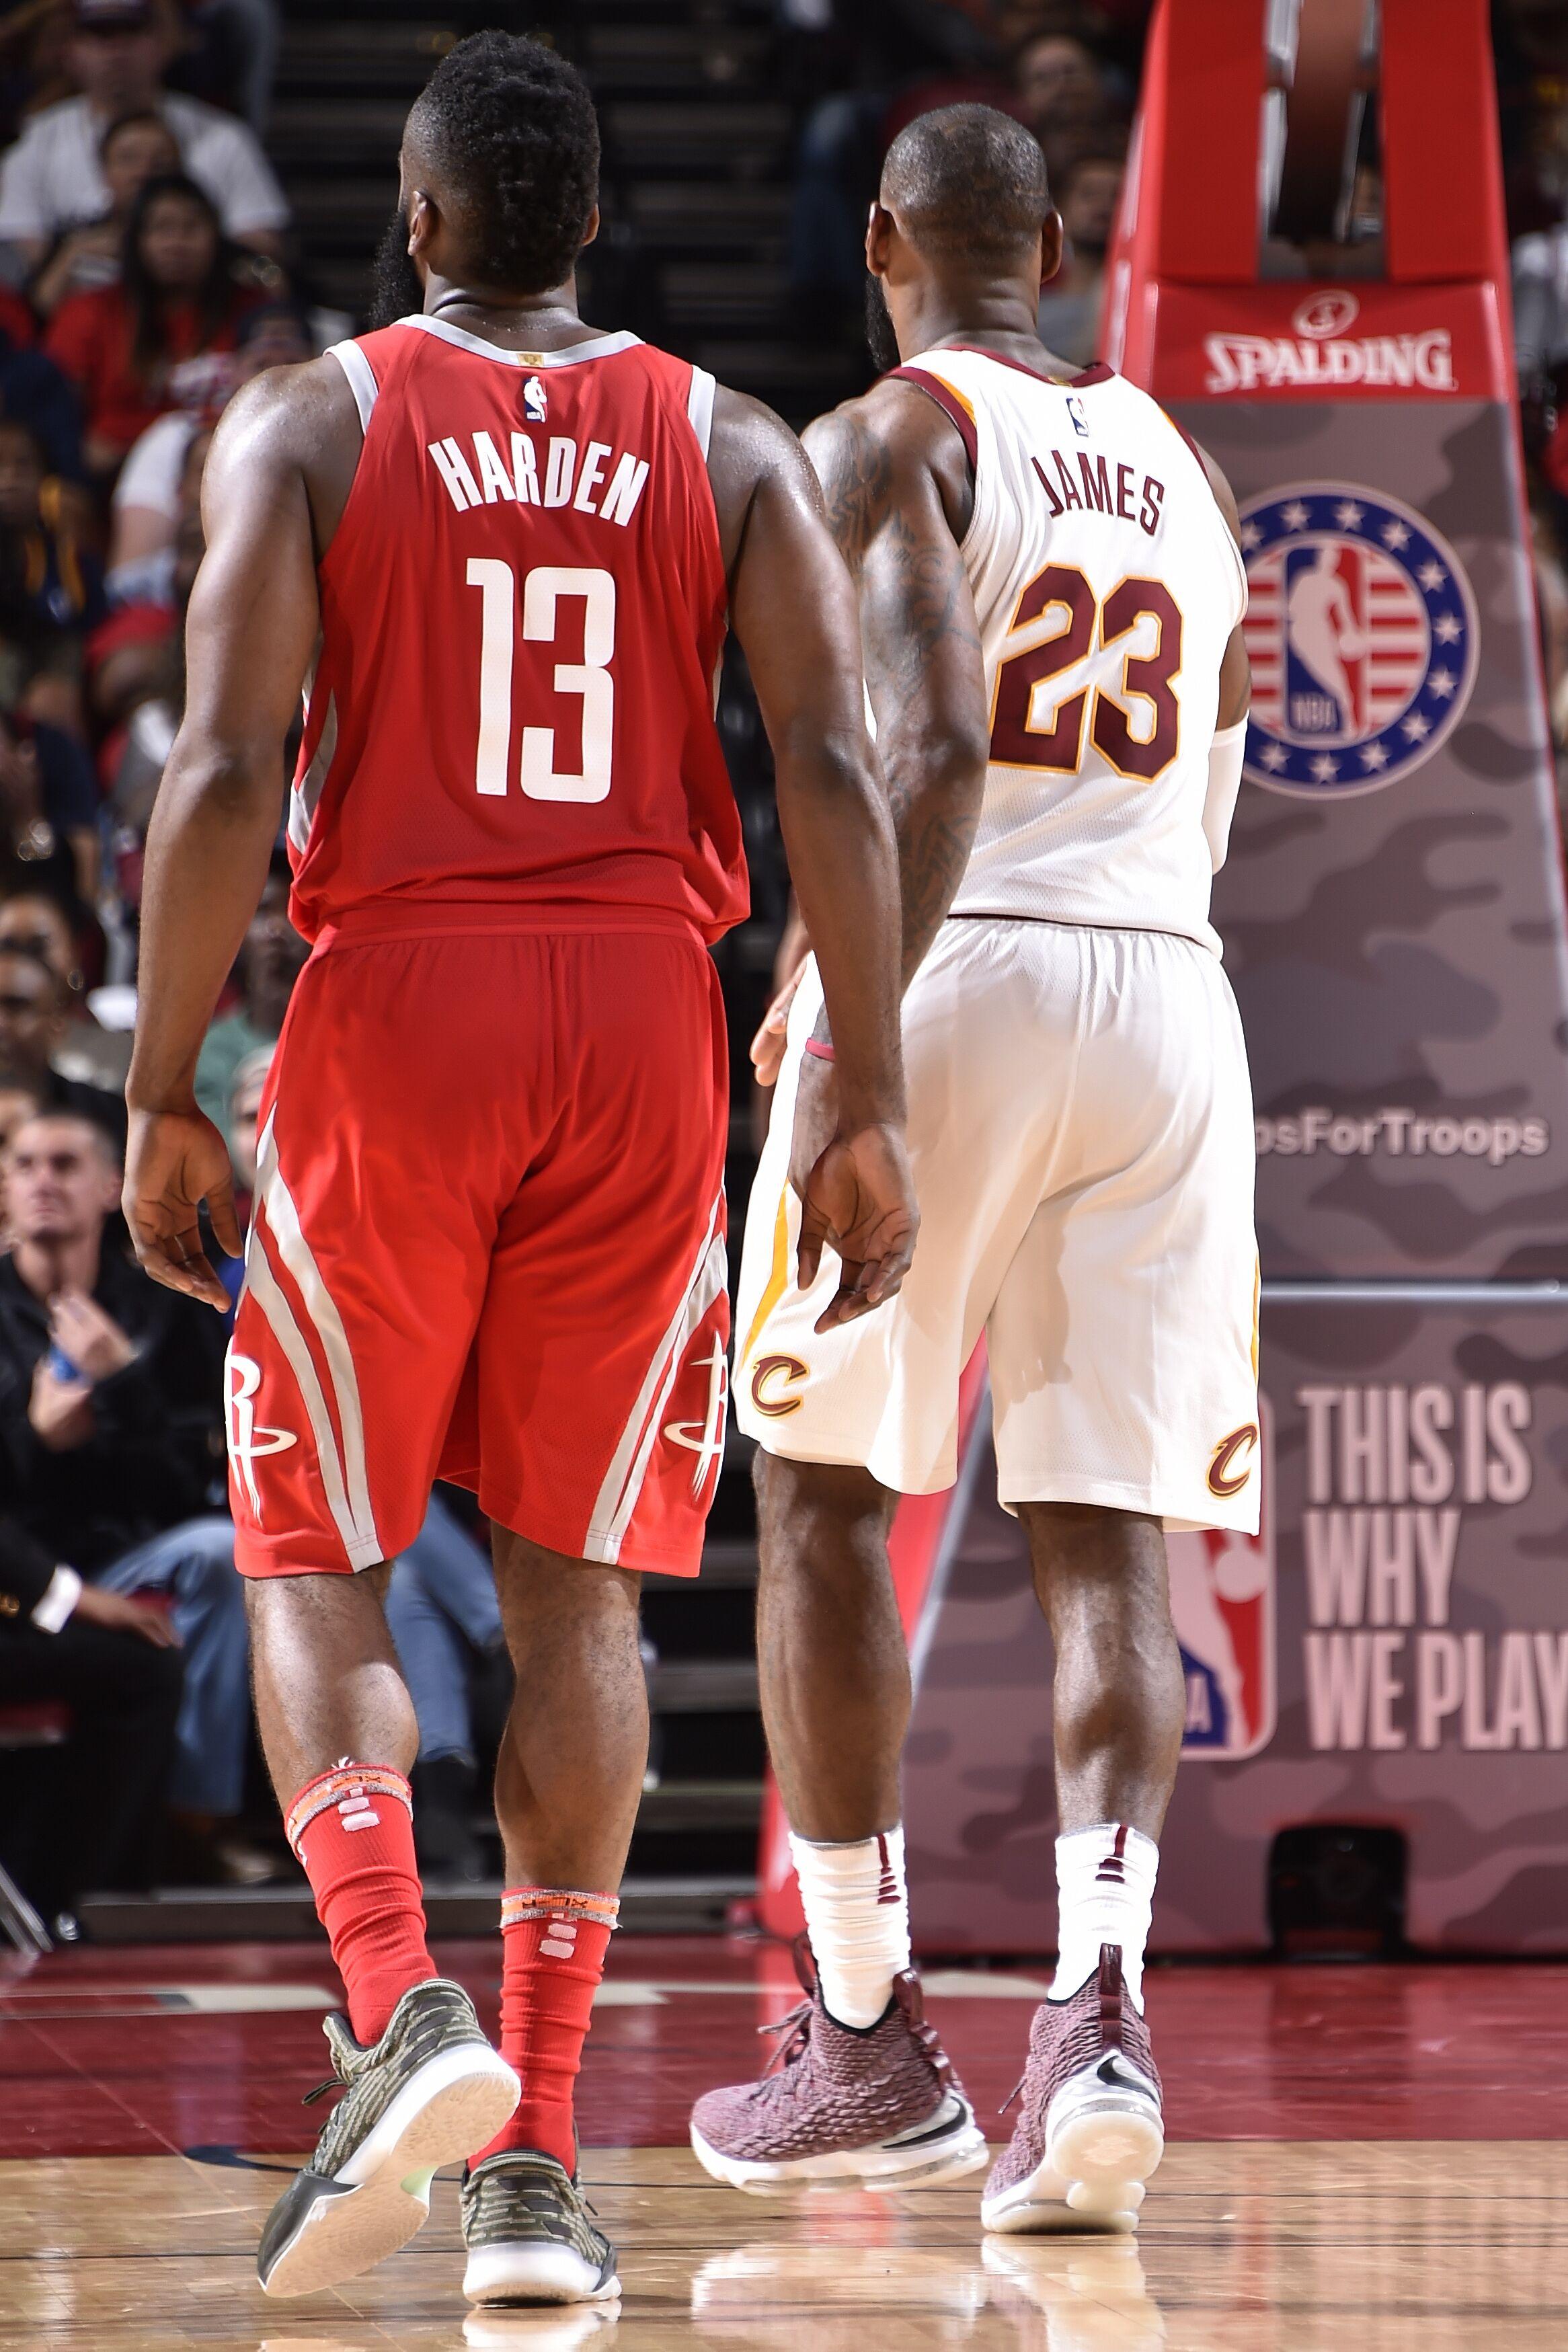 d0550dd3a59c The 2017-18 NBA MVP Race  LeBron James vs James Harden